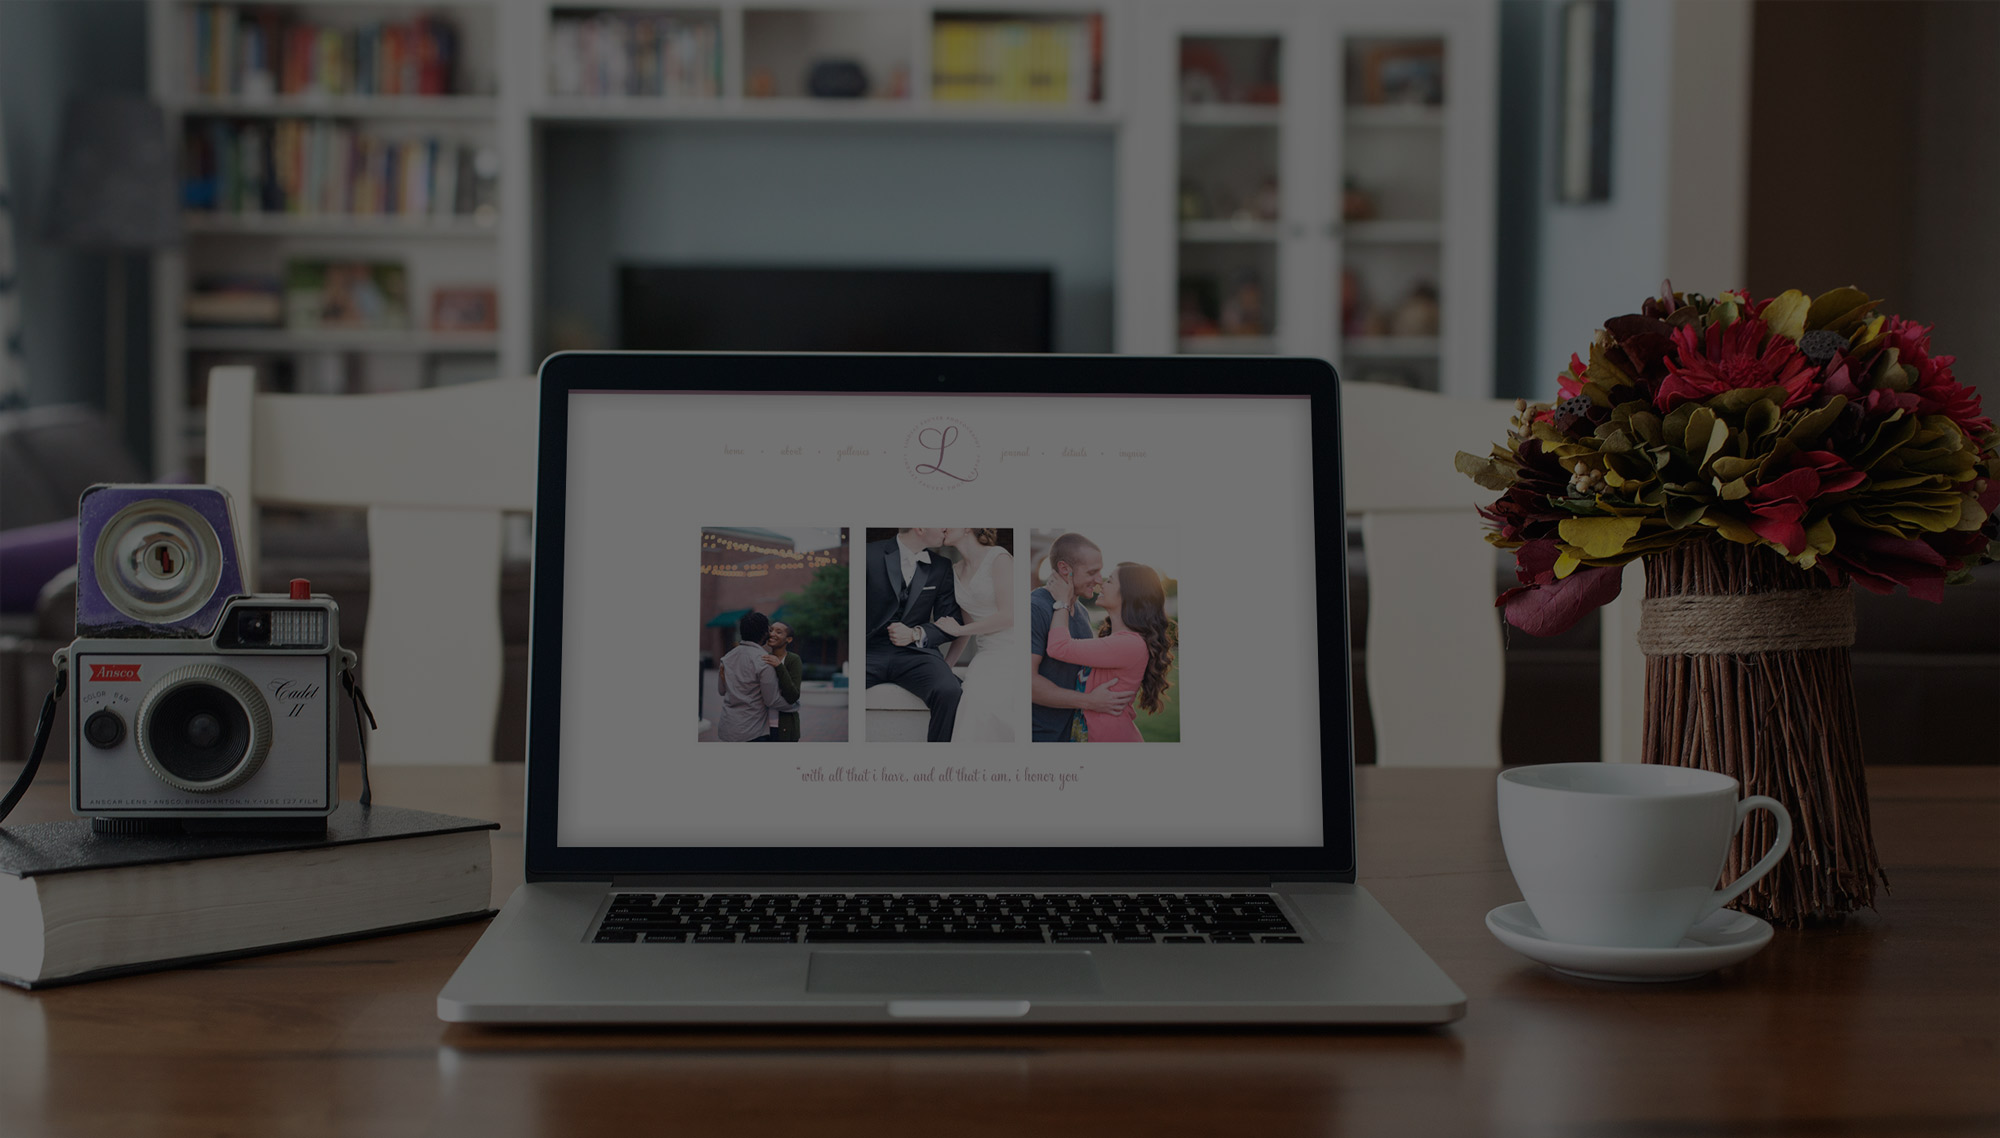 Reston web design | Custom website designer for photographers